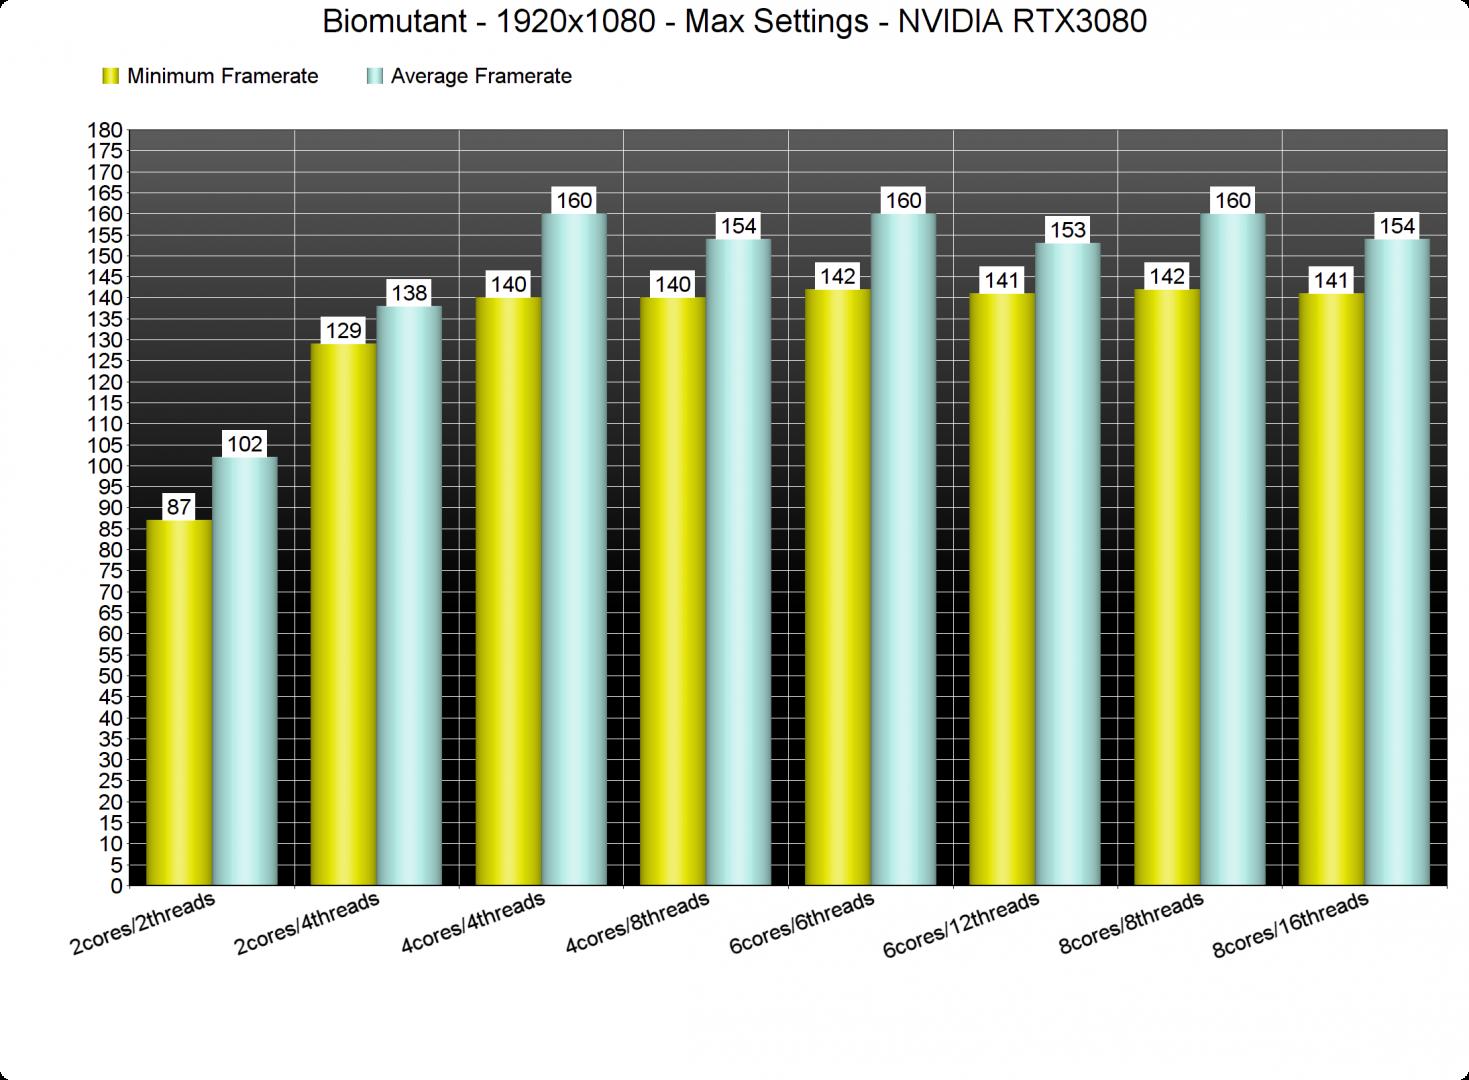 Biomutant CPU benchmarks